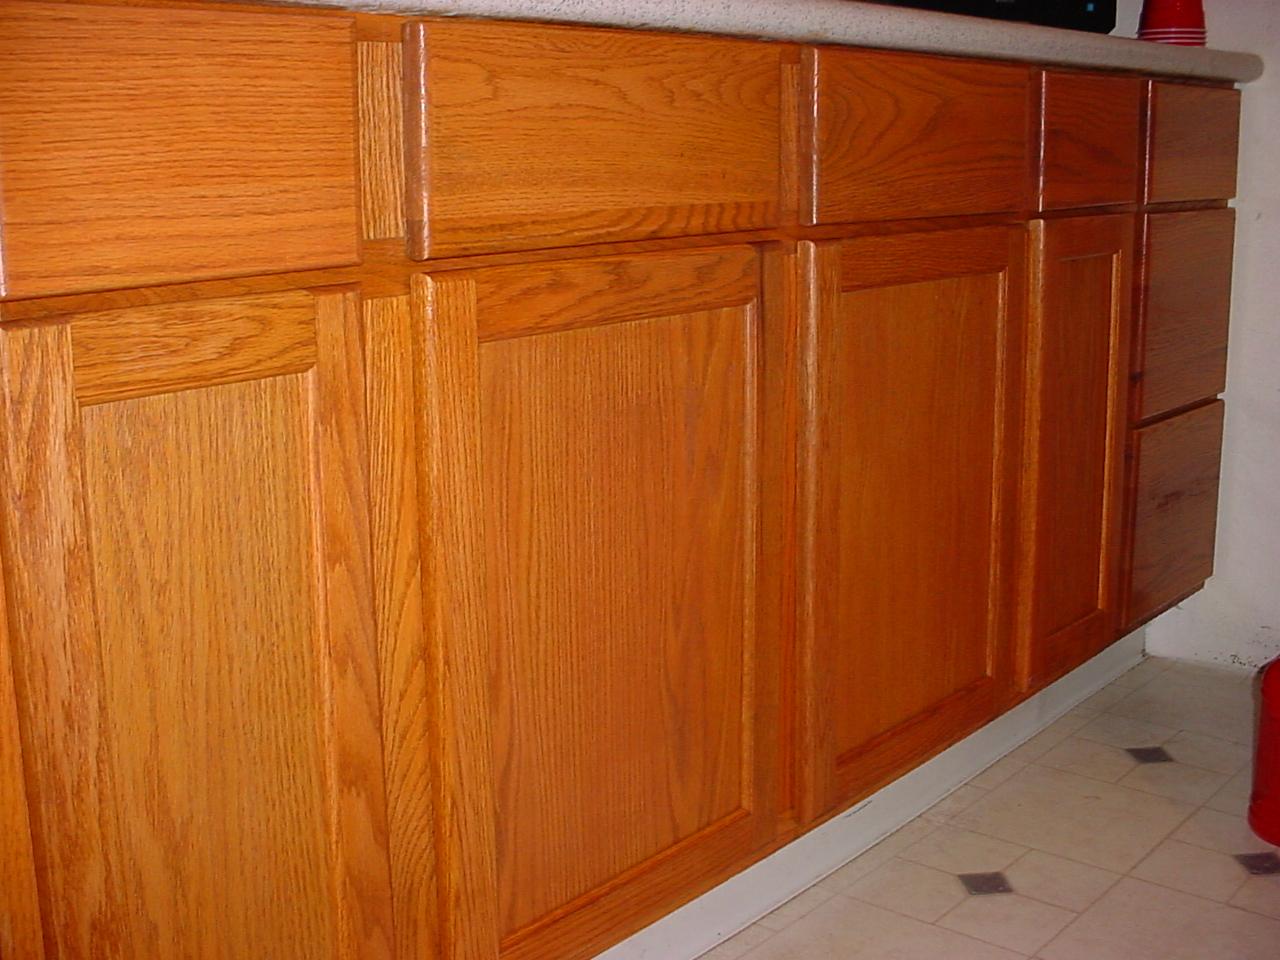 justlikenewcabinets wordpress staining kitchen cabinets Here s